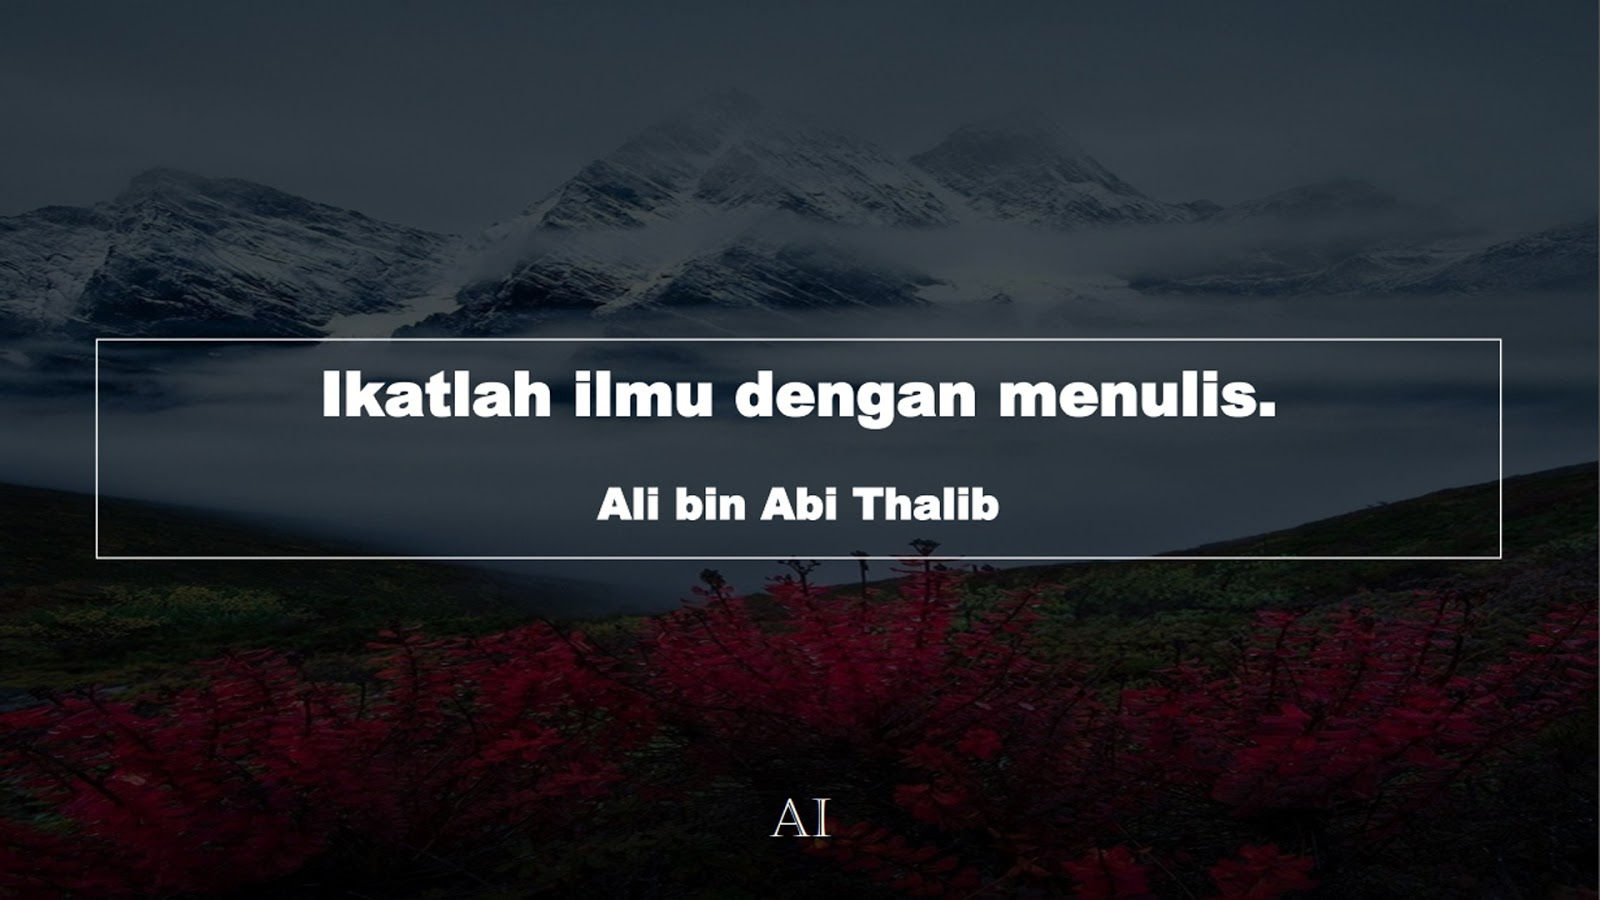 Wallpaper Kata Bijak Ali bin Abi Thalib  (Ikatlah ilmu dengan menulis.)